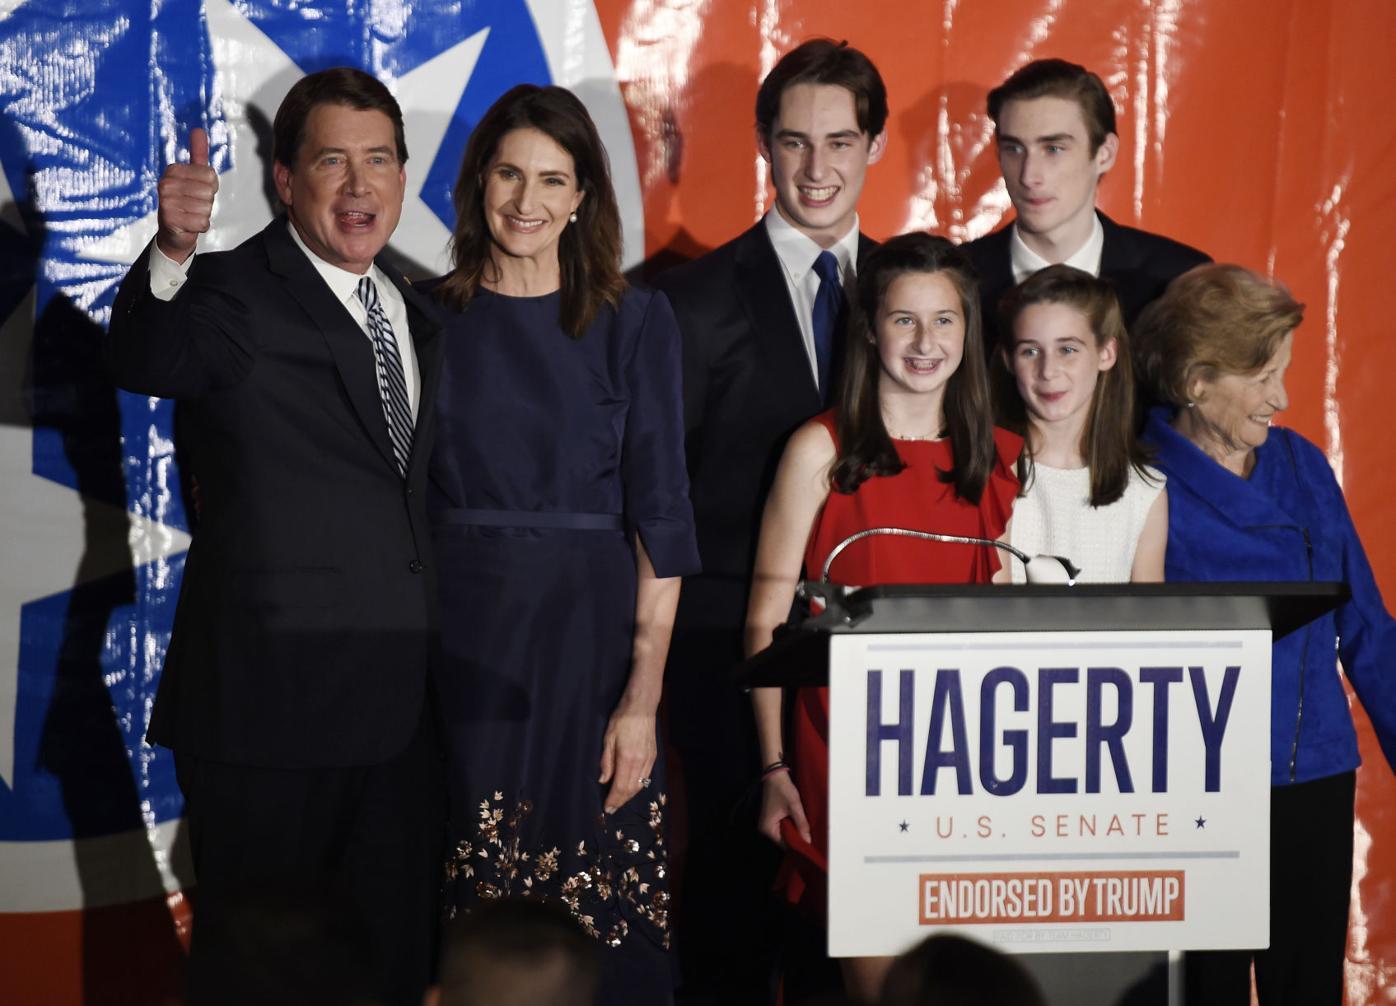 Election 2020 Senate Hagerty